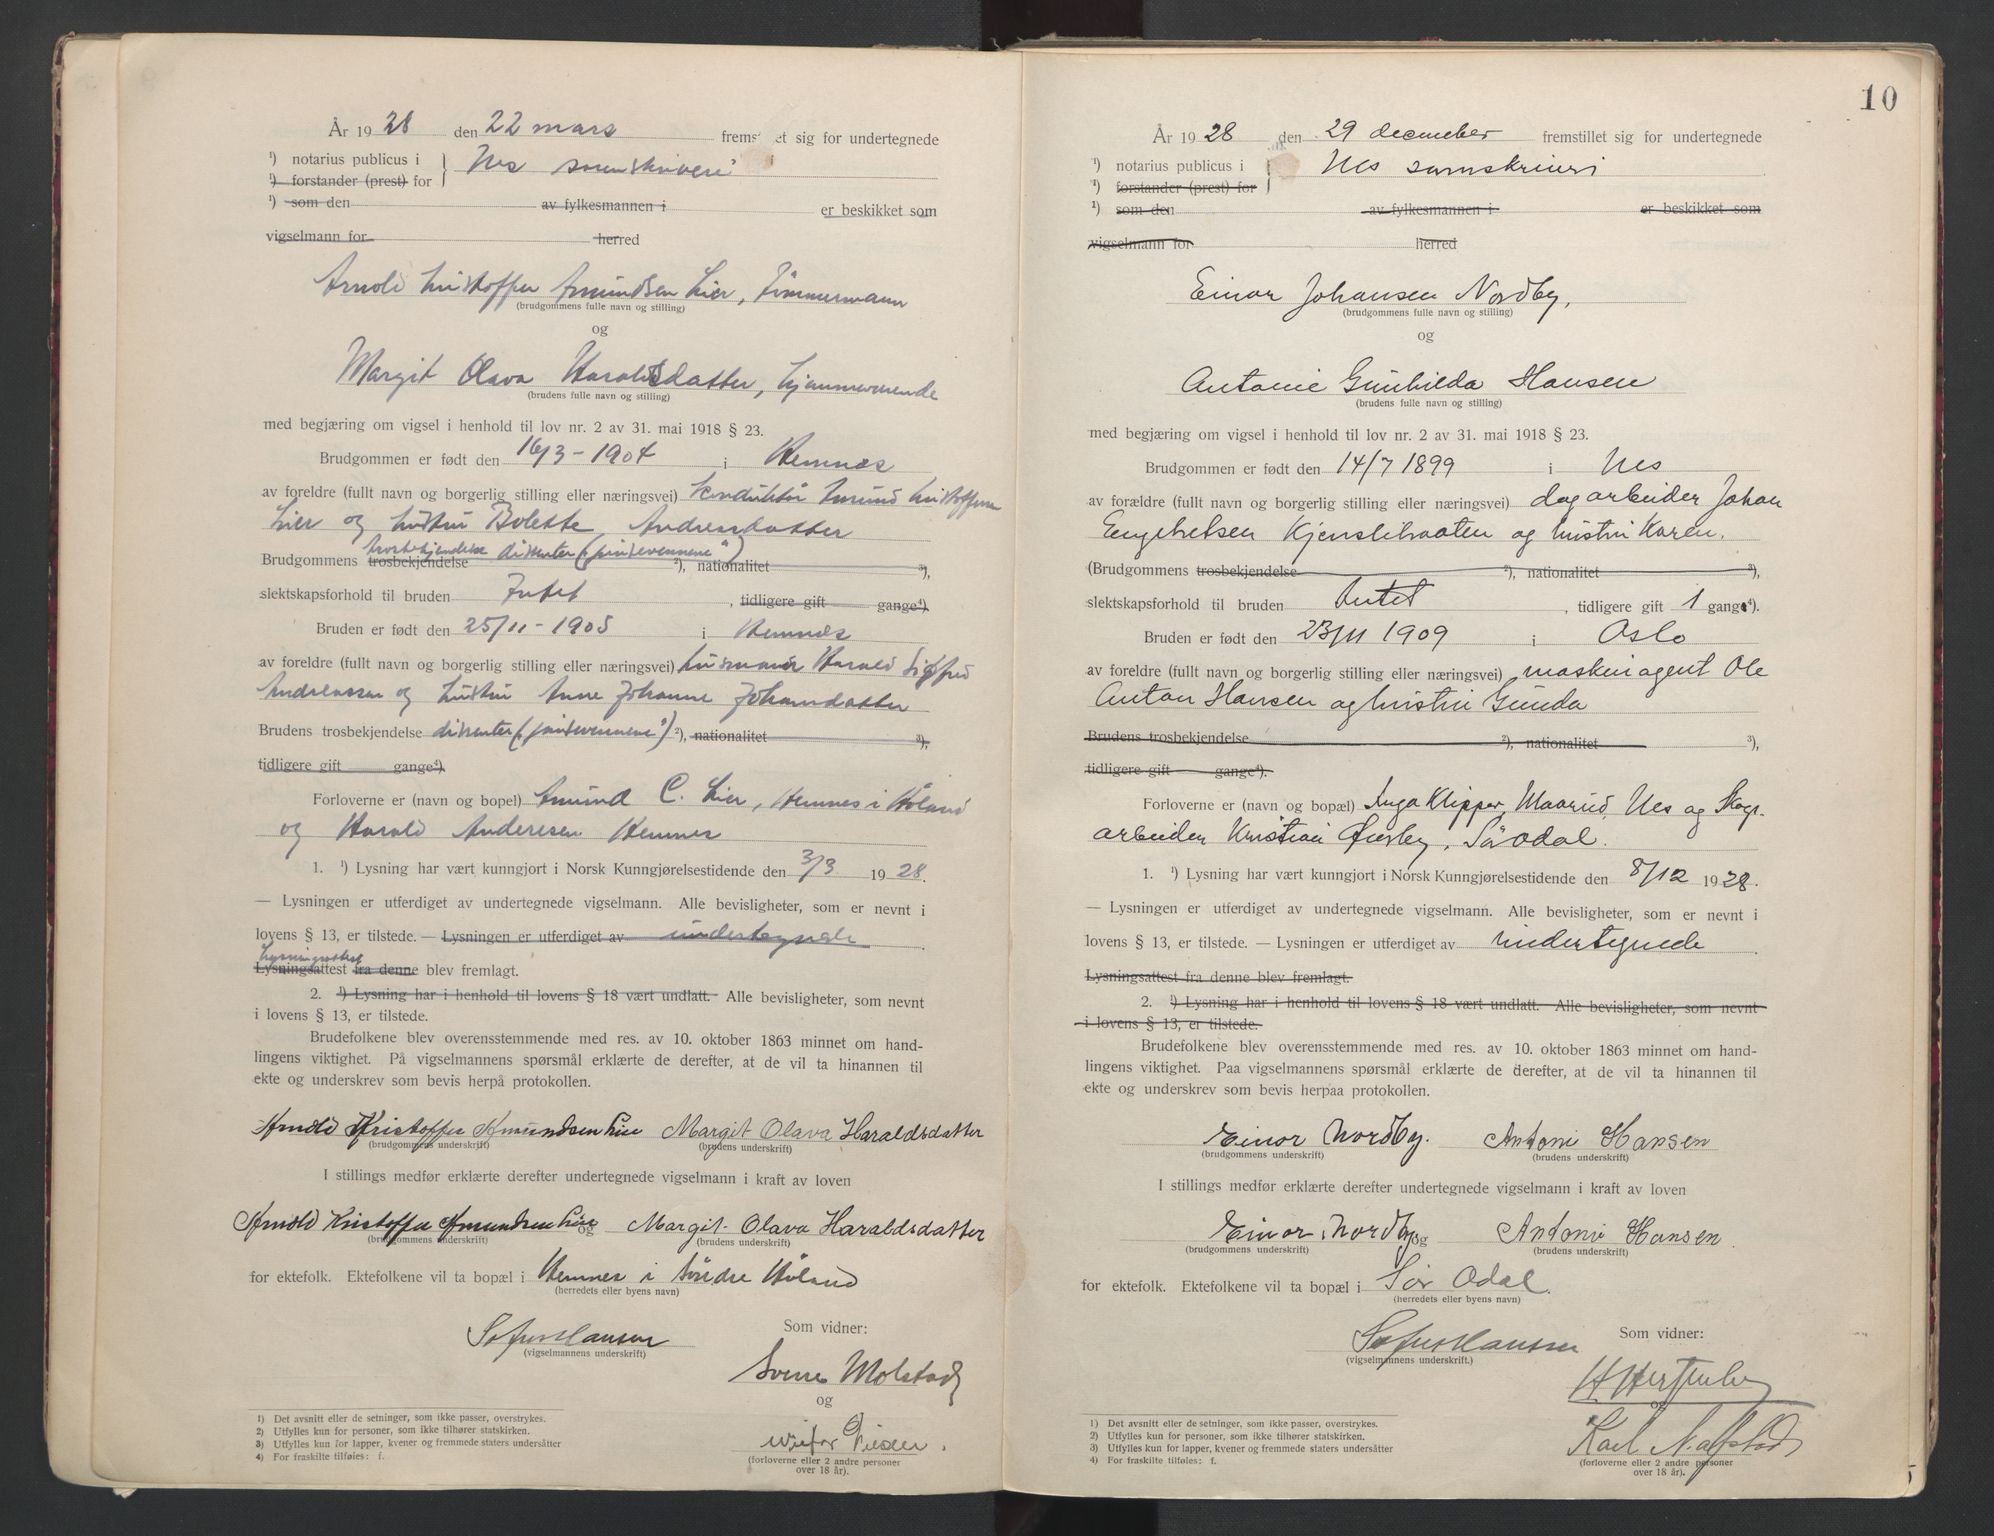 SAO, Nes tingrett, L/Lc/Lca/L0001: Vigselbok, 1920-1943, s. 10